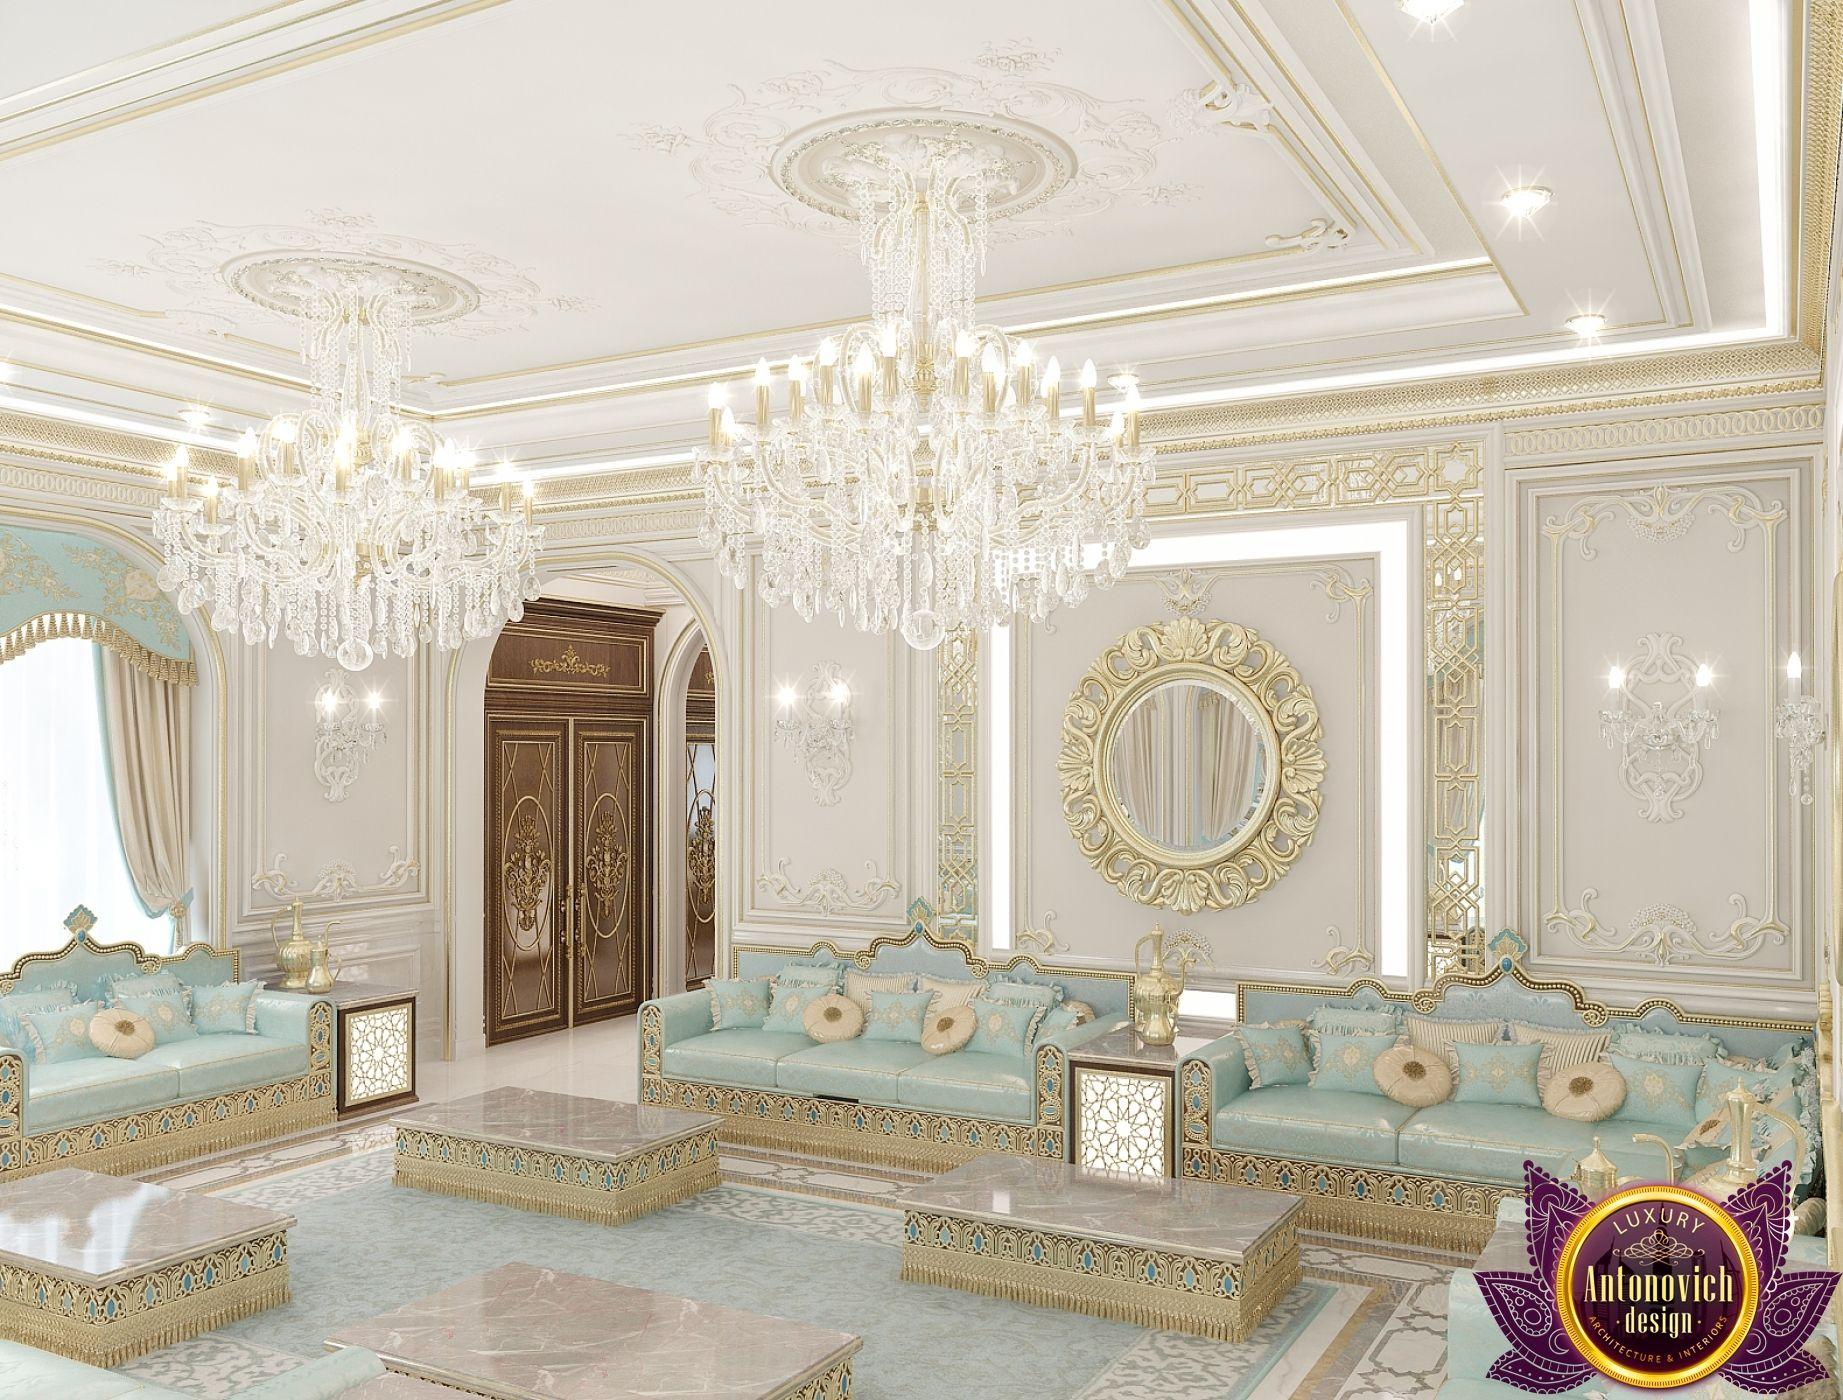 Majlis Interior Design In Dubai Luxury Lady Majlis Design